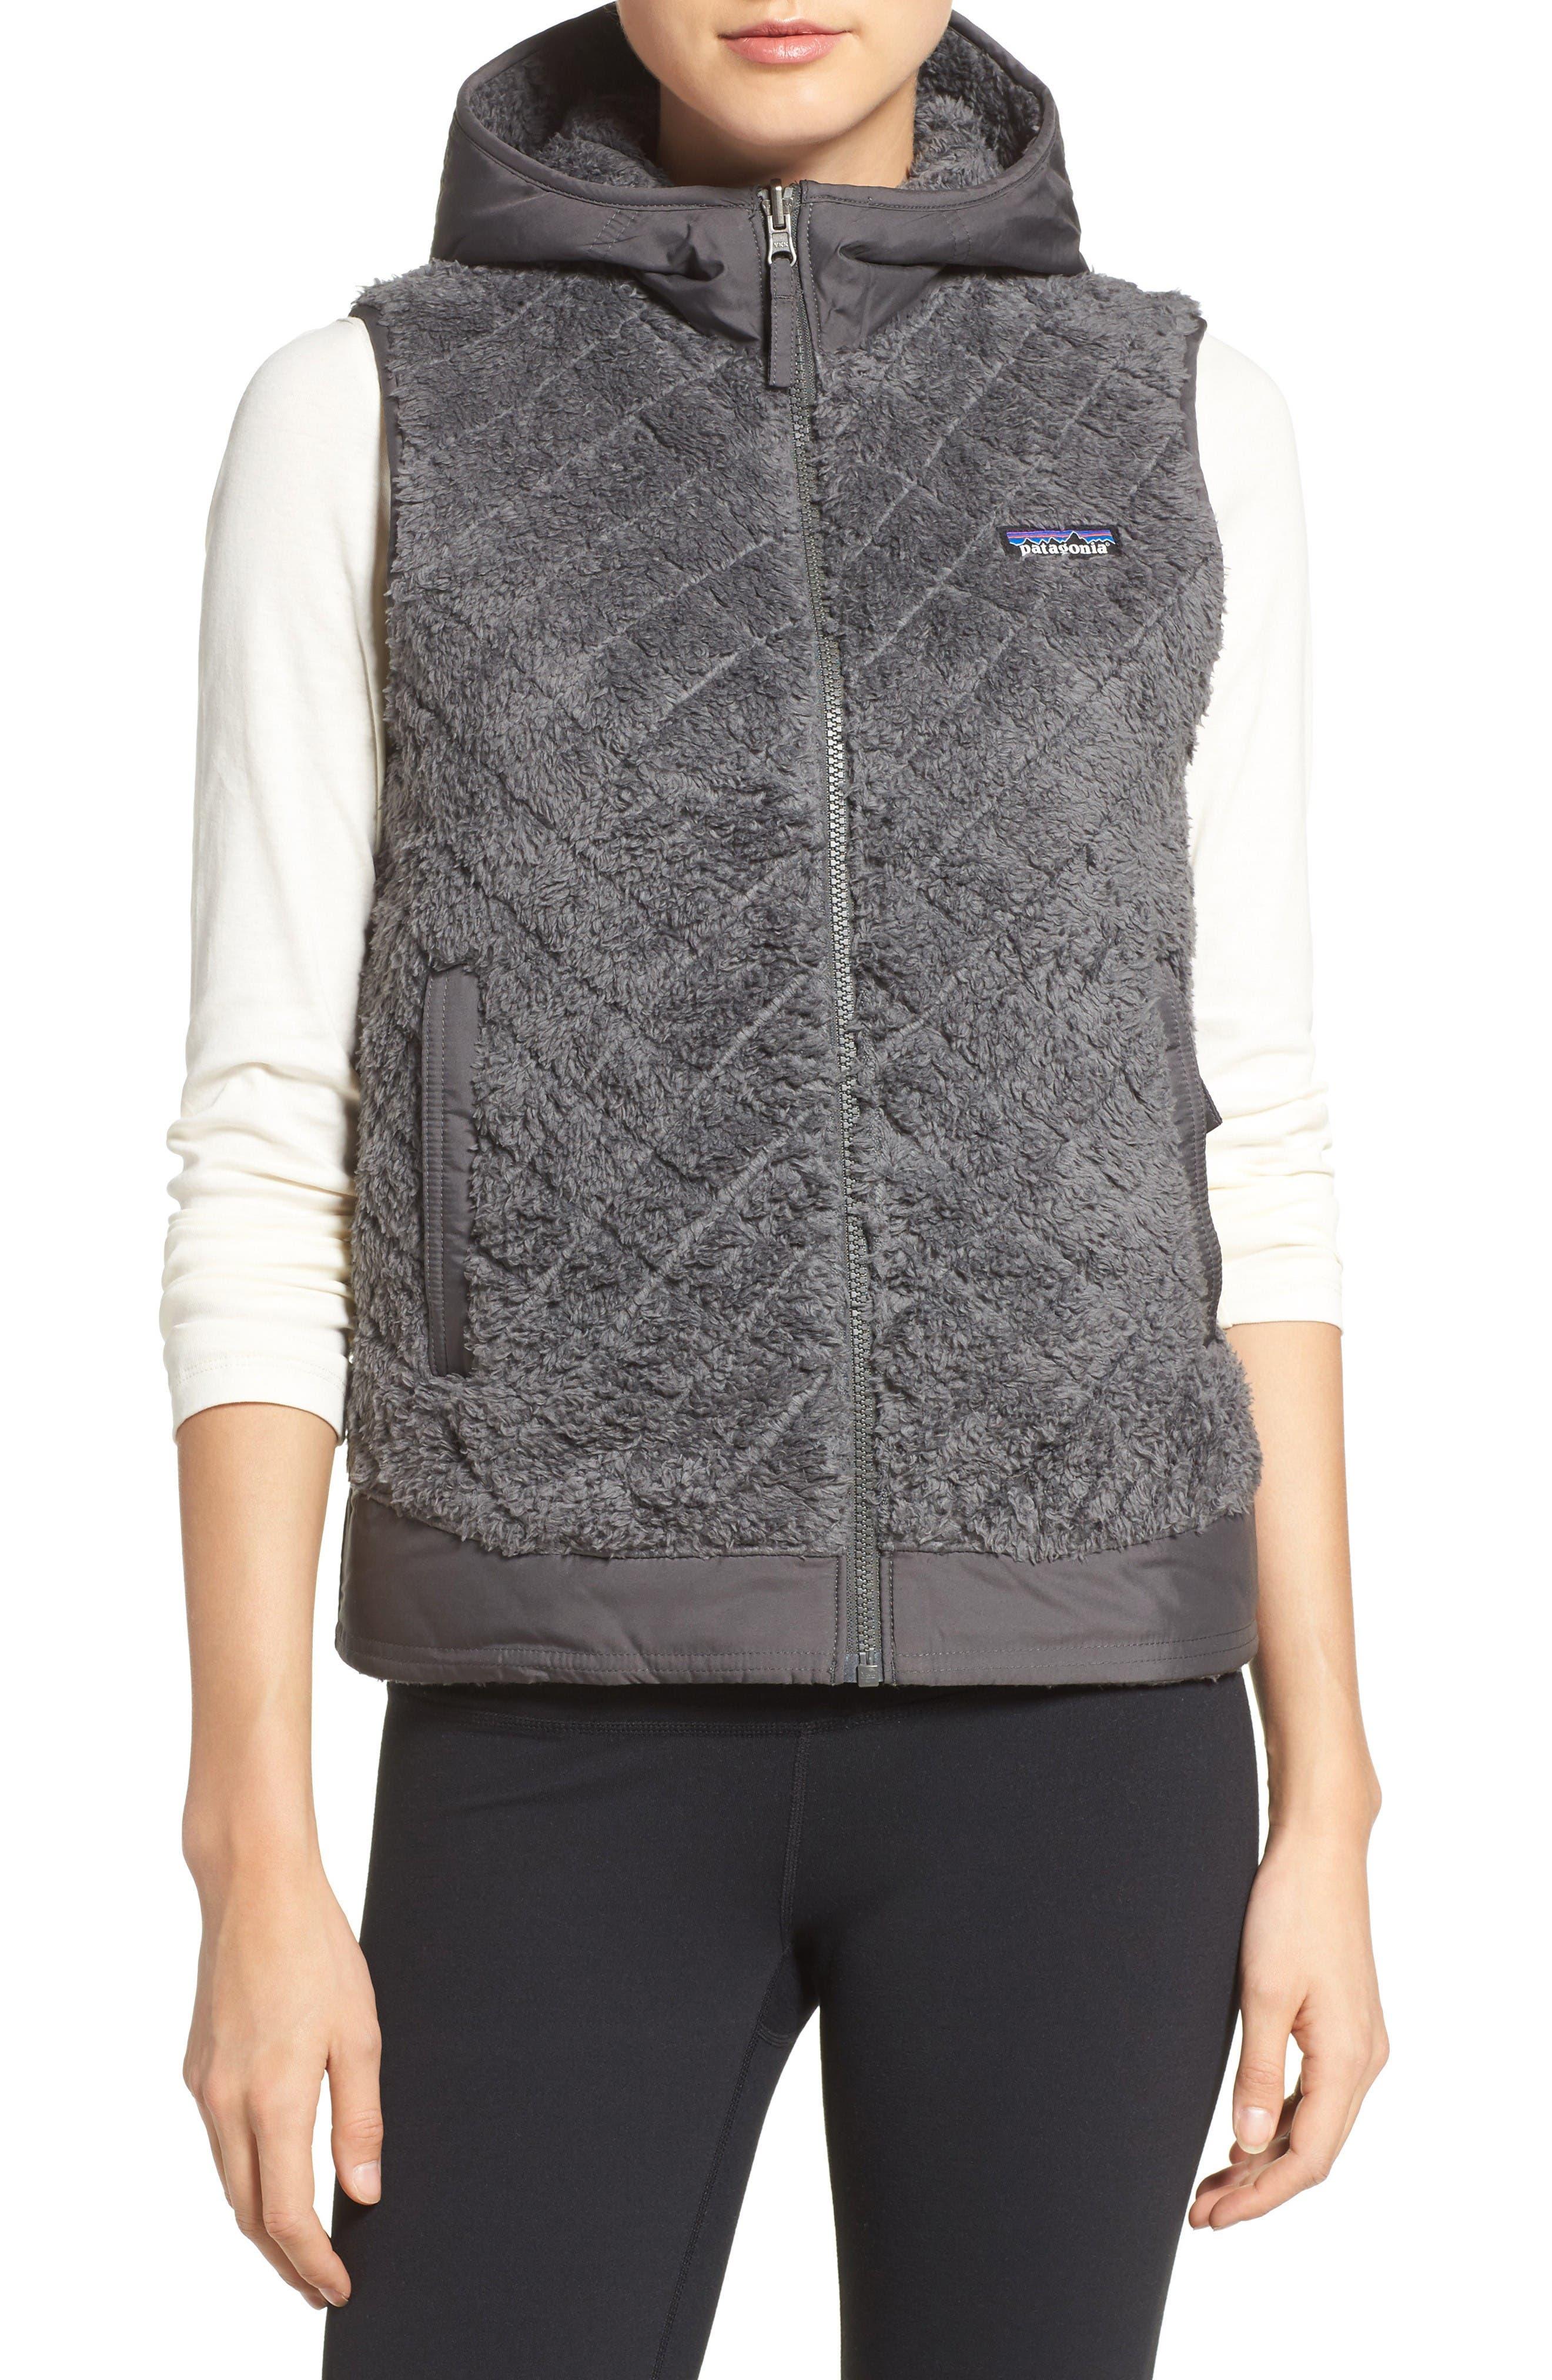 Alternate Image 1 Selected - Patagonia Los Gatos Reversible Vest